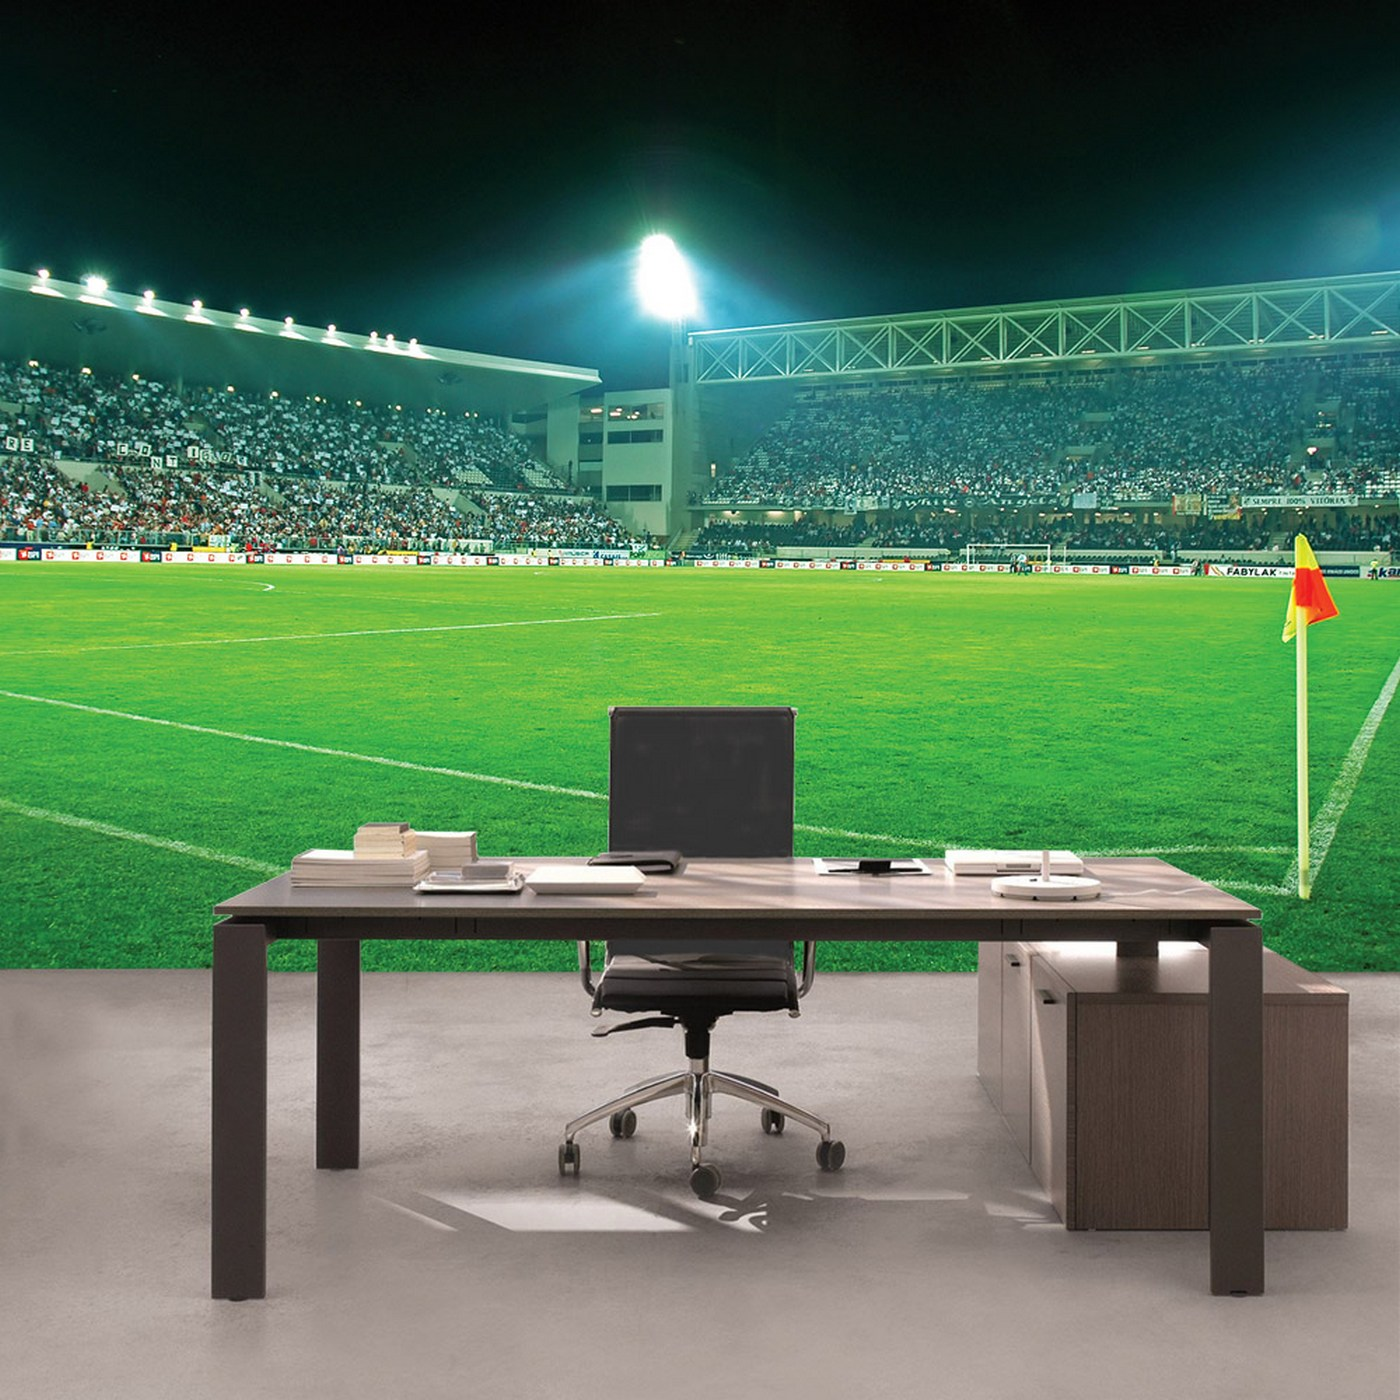 Vlies Fototapete 2525 - Sport Tapete Fußball Stadion Flutlicht Rasen  Tribüne grün